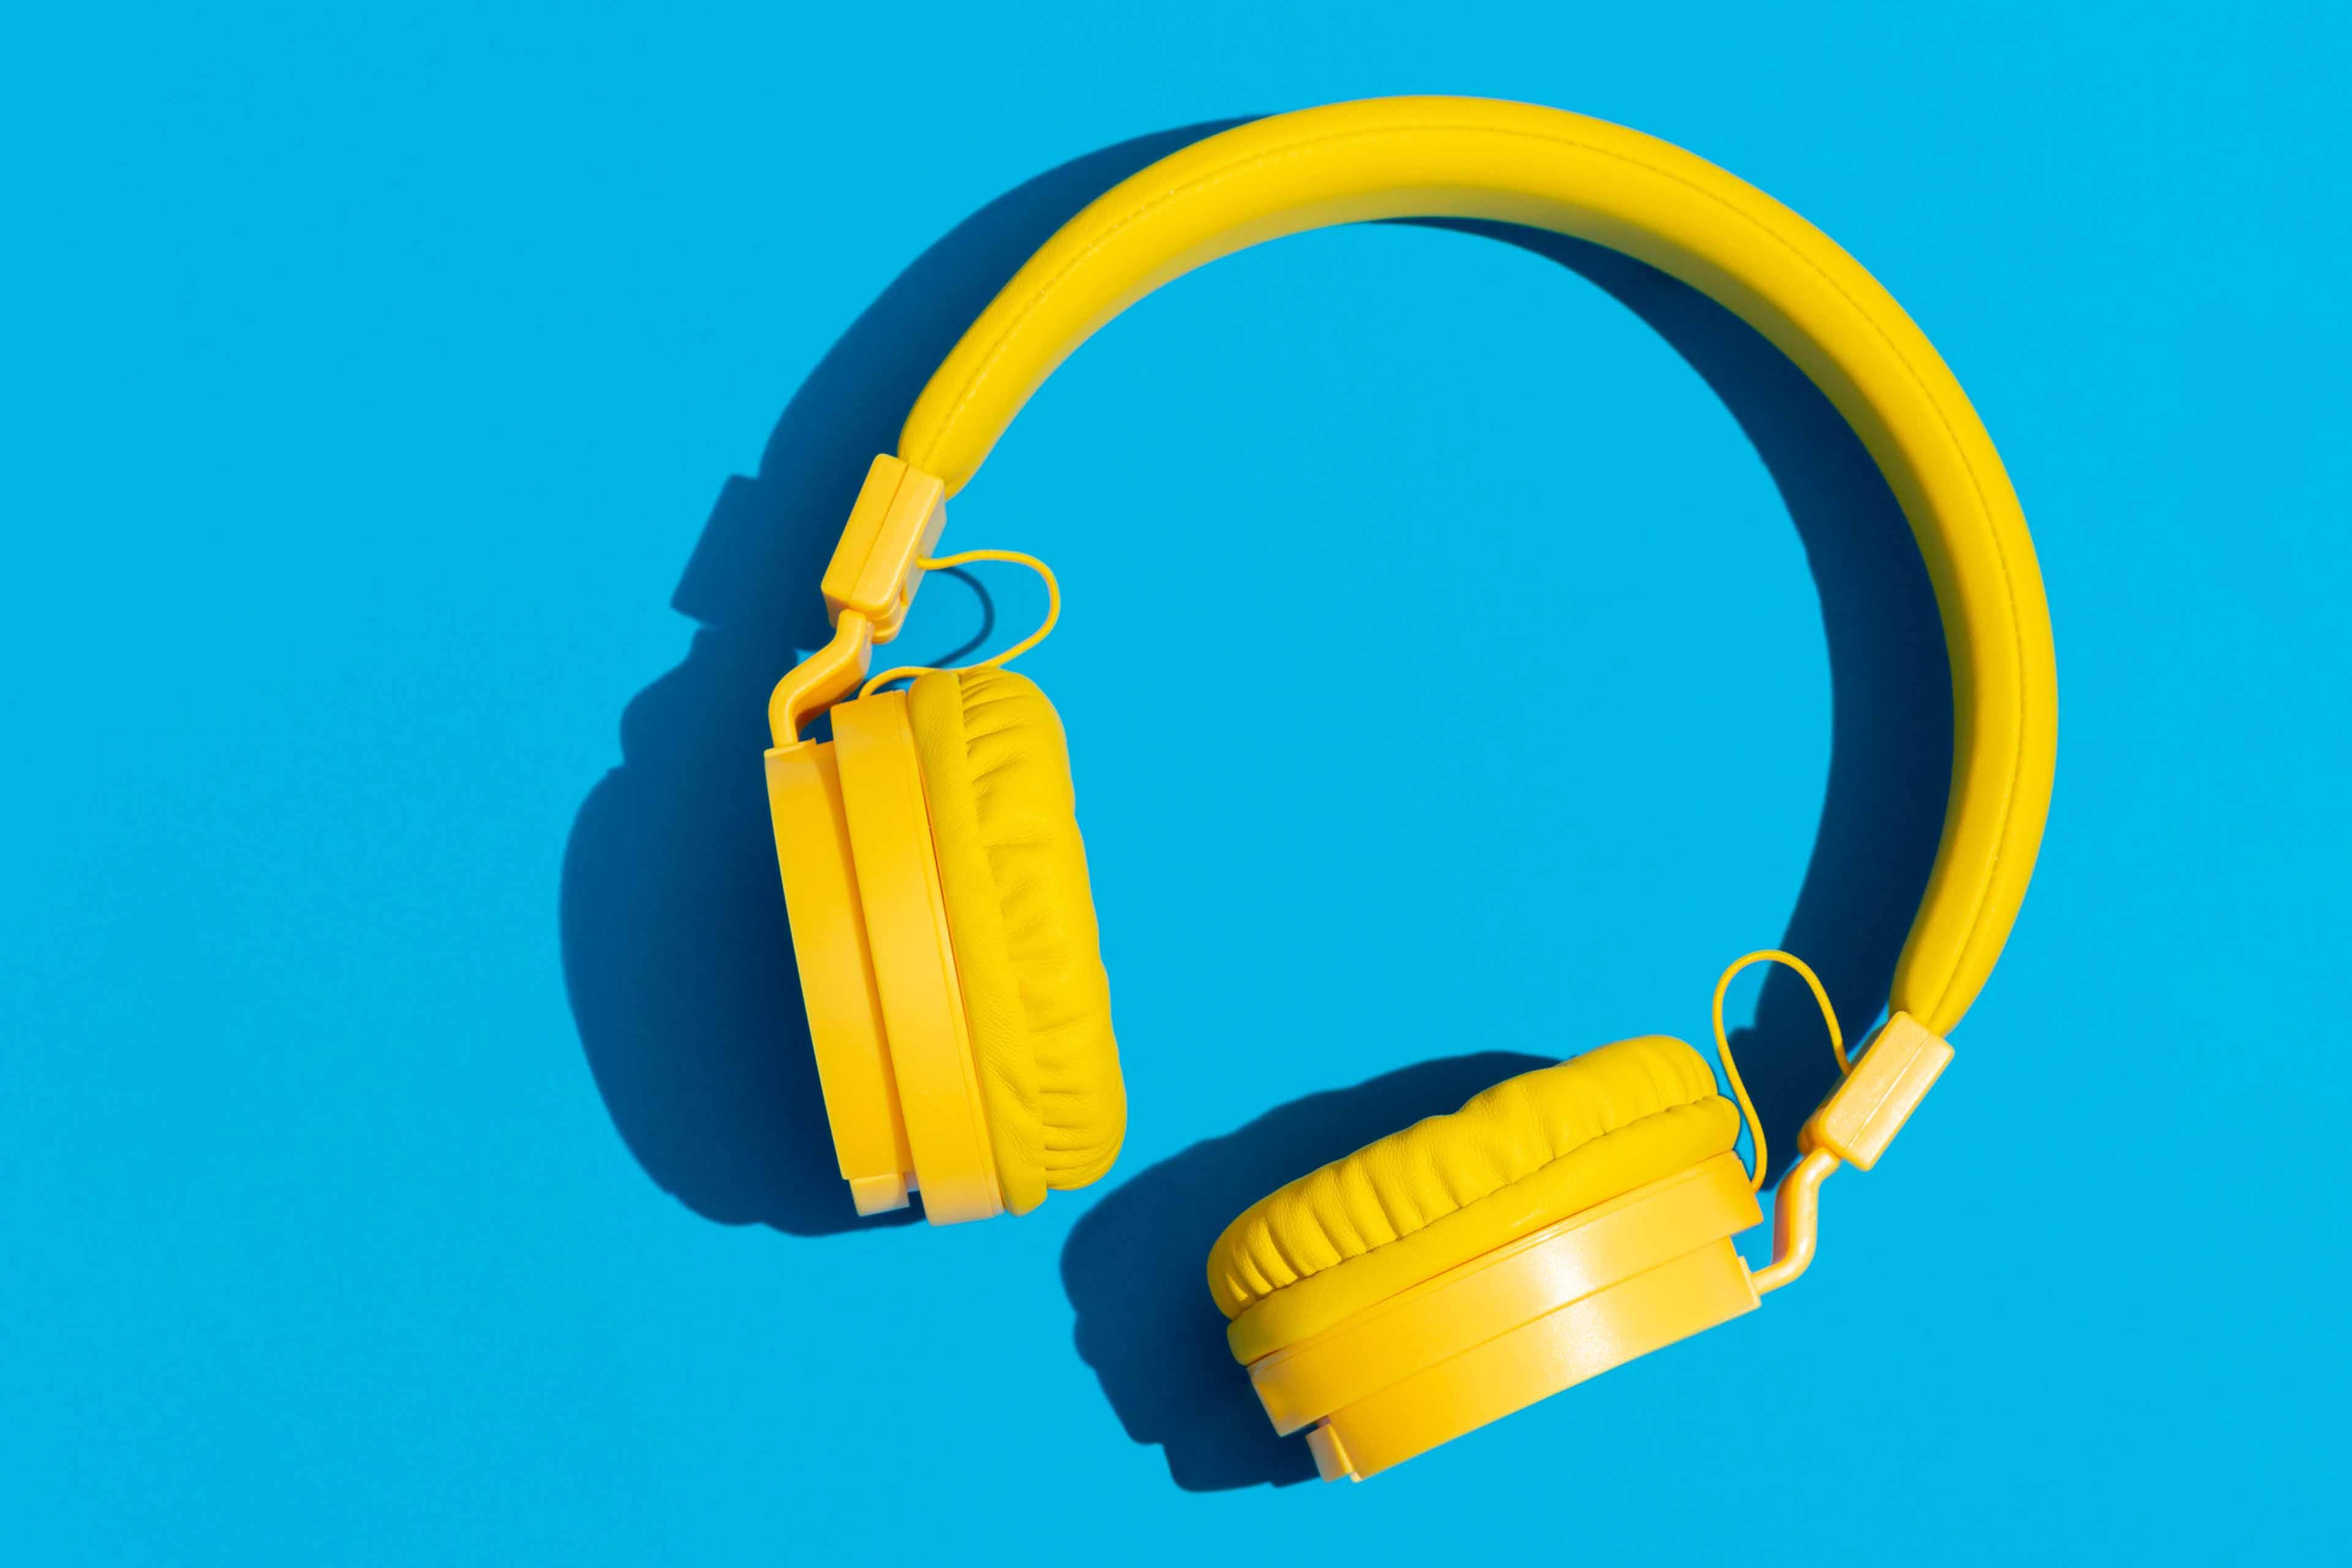 ey-headset-transformation-tacheles-podcast-version1-20210223